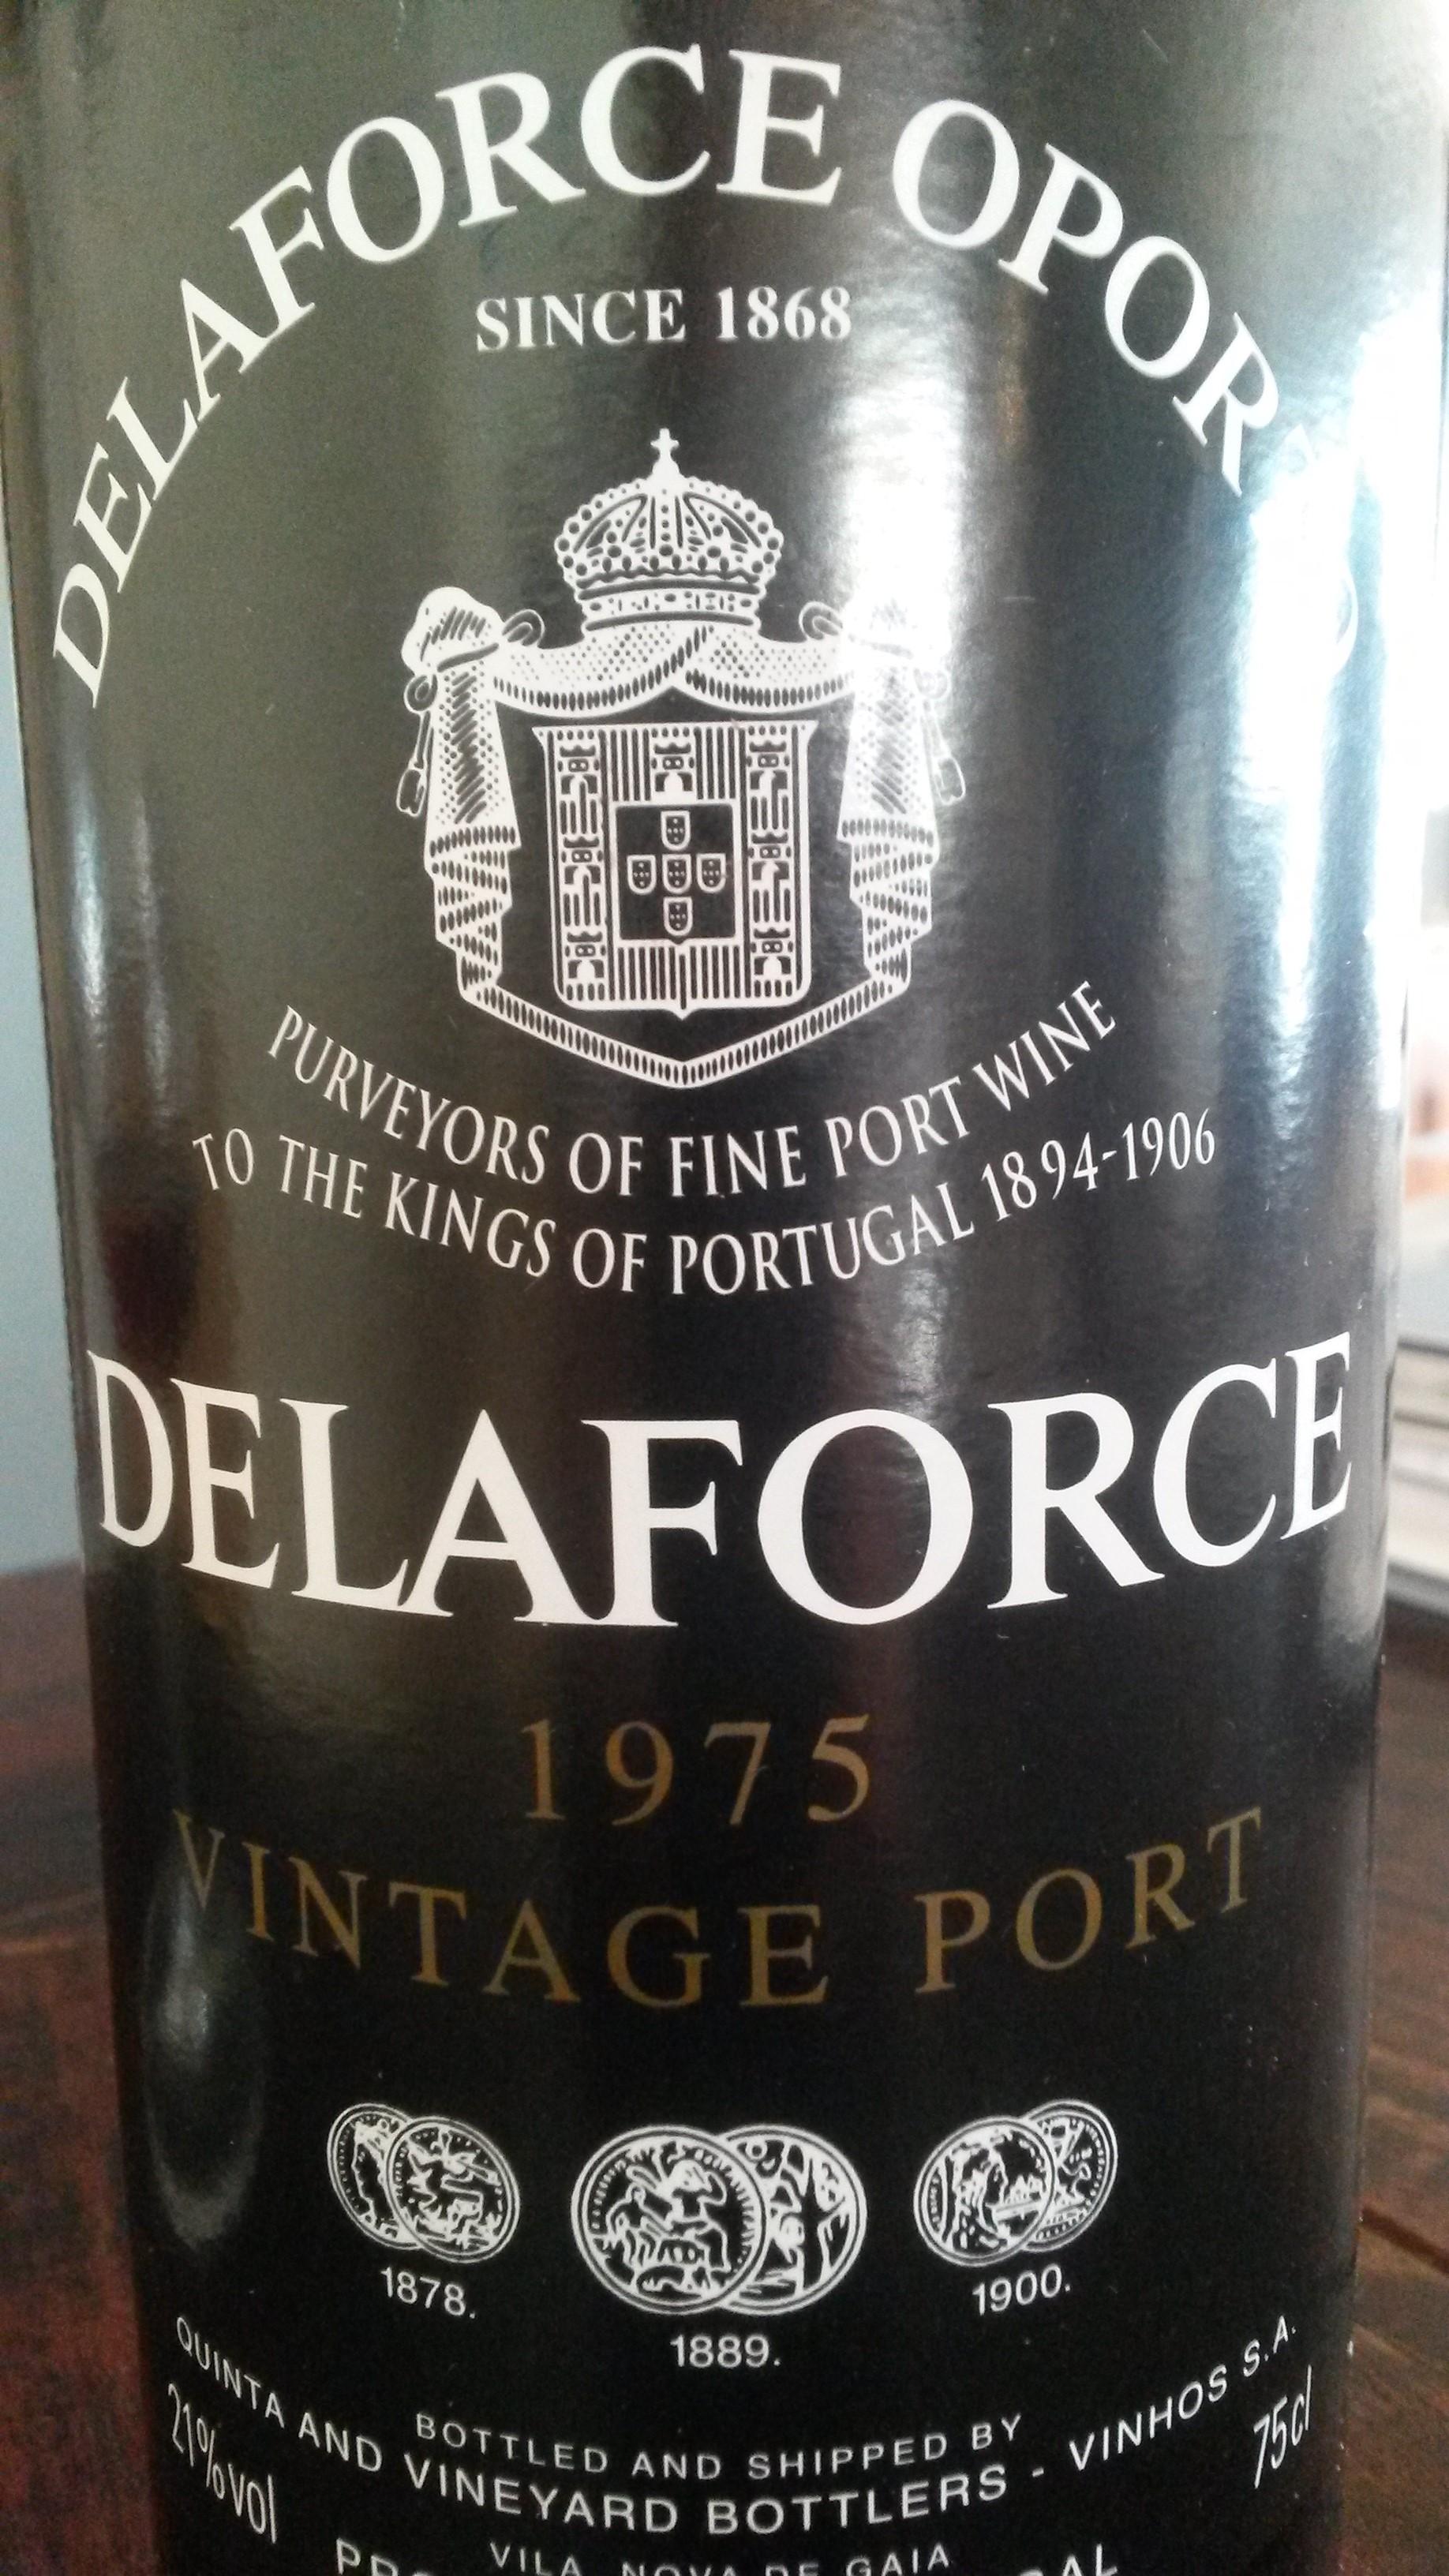 Delaforce vintage 1975